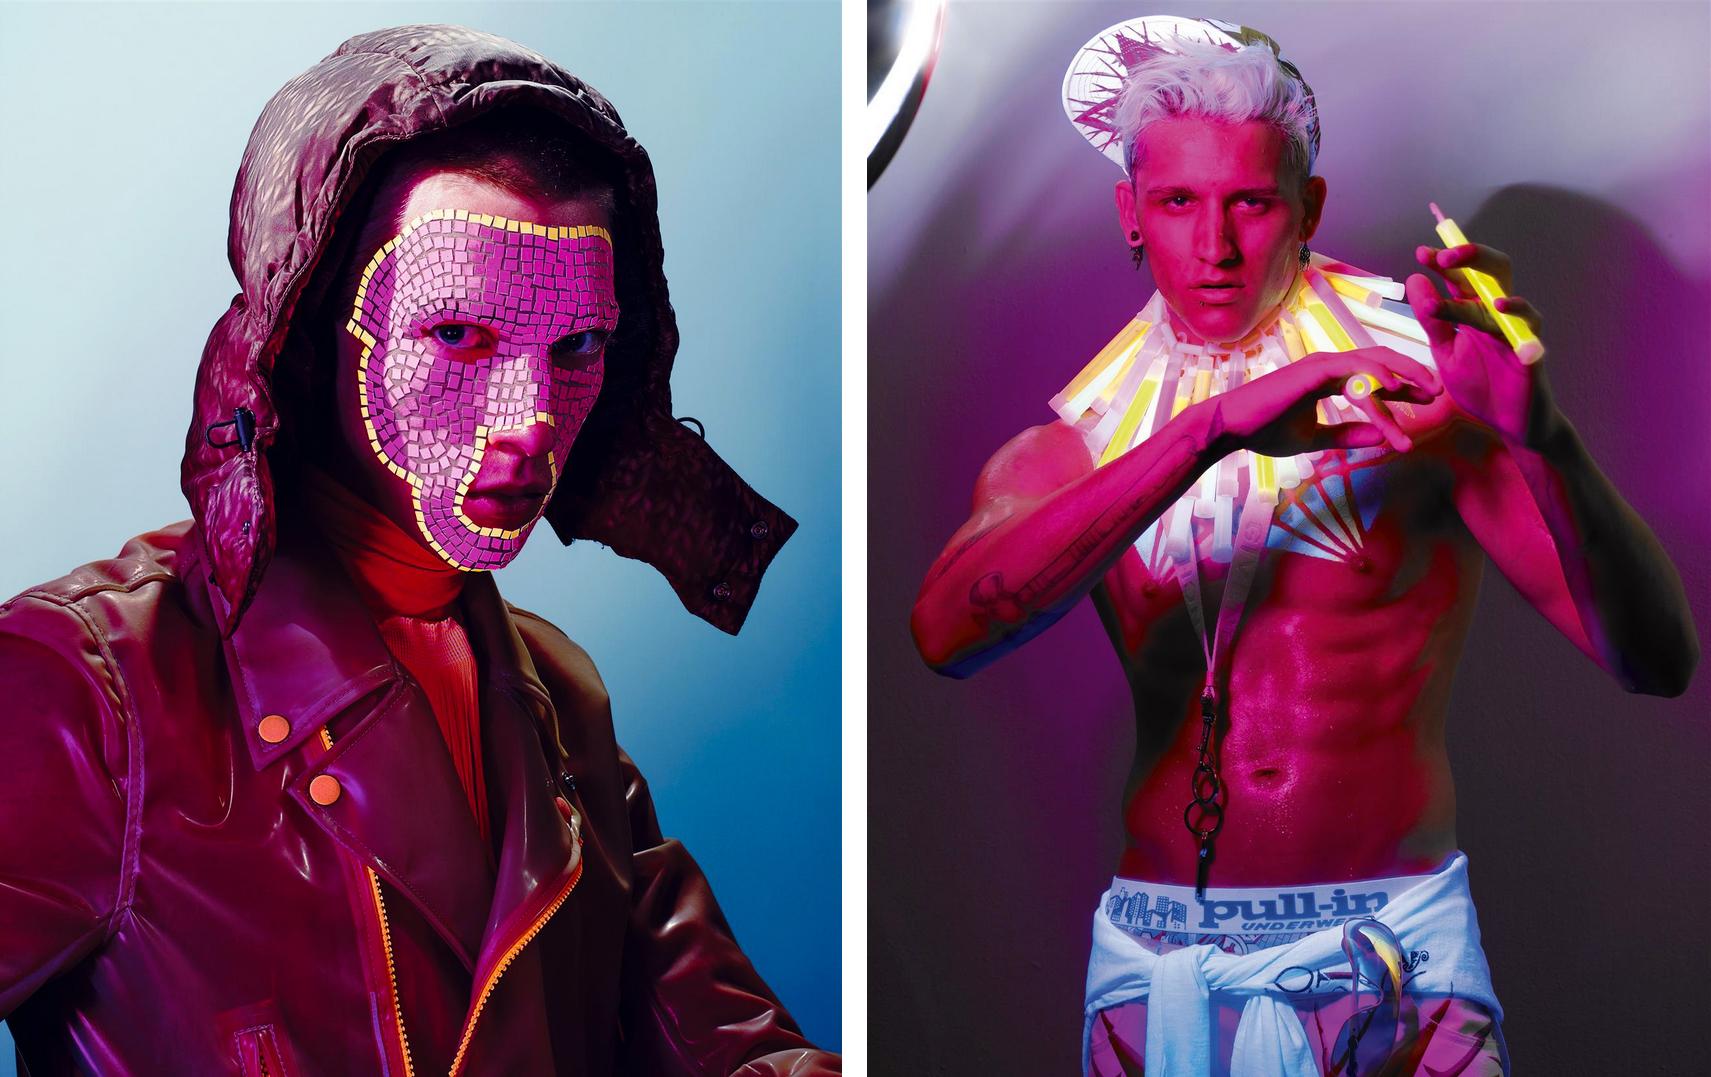 Weidro mag. Magazine, Photographers RICHARD BURBRIDGE -Art + COMMERCE